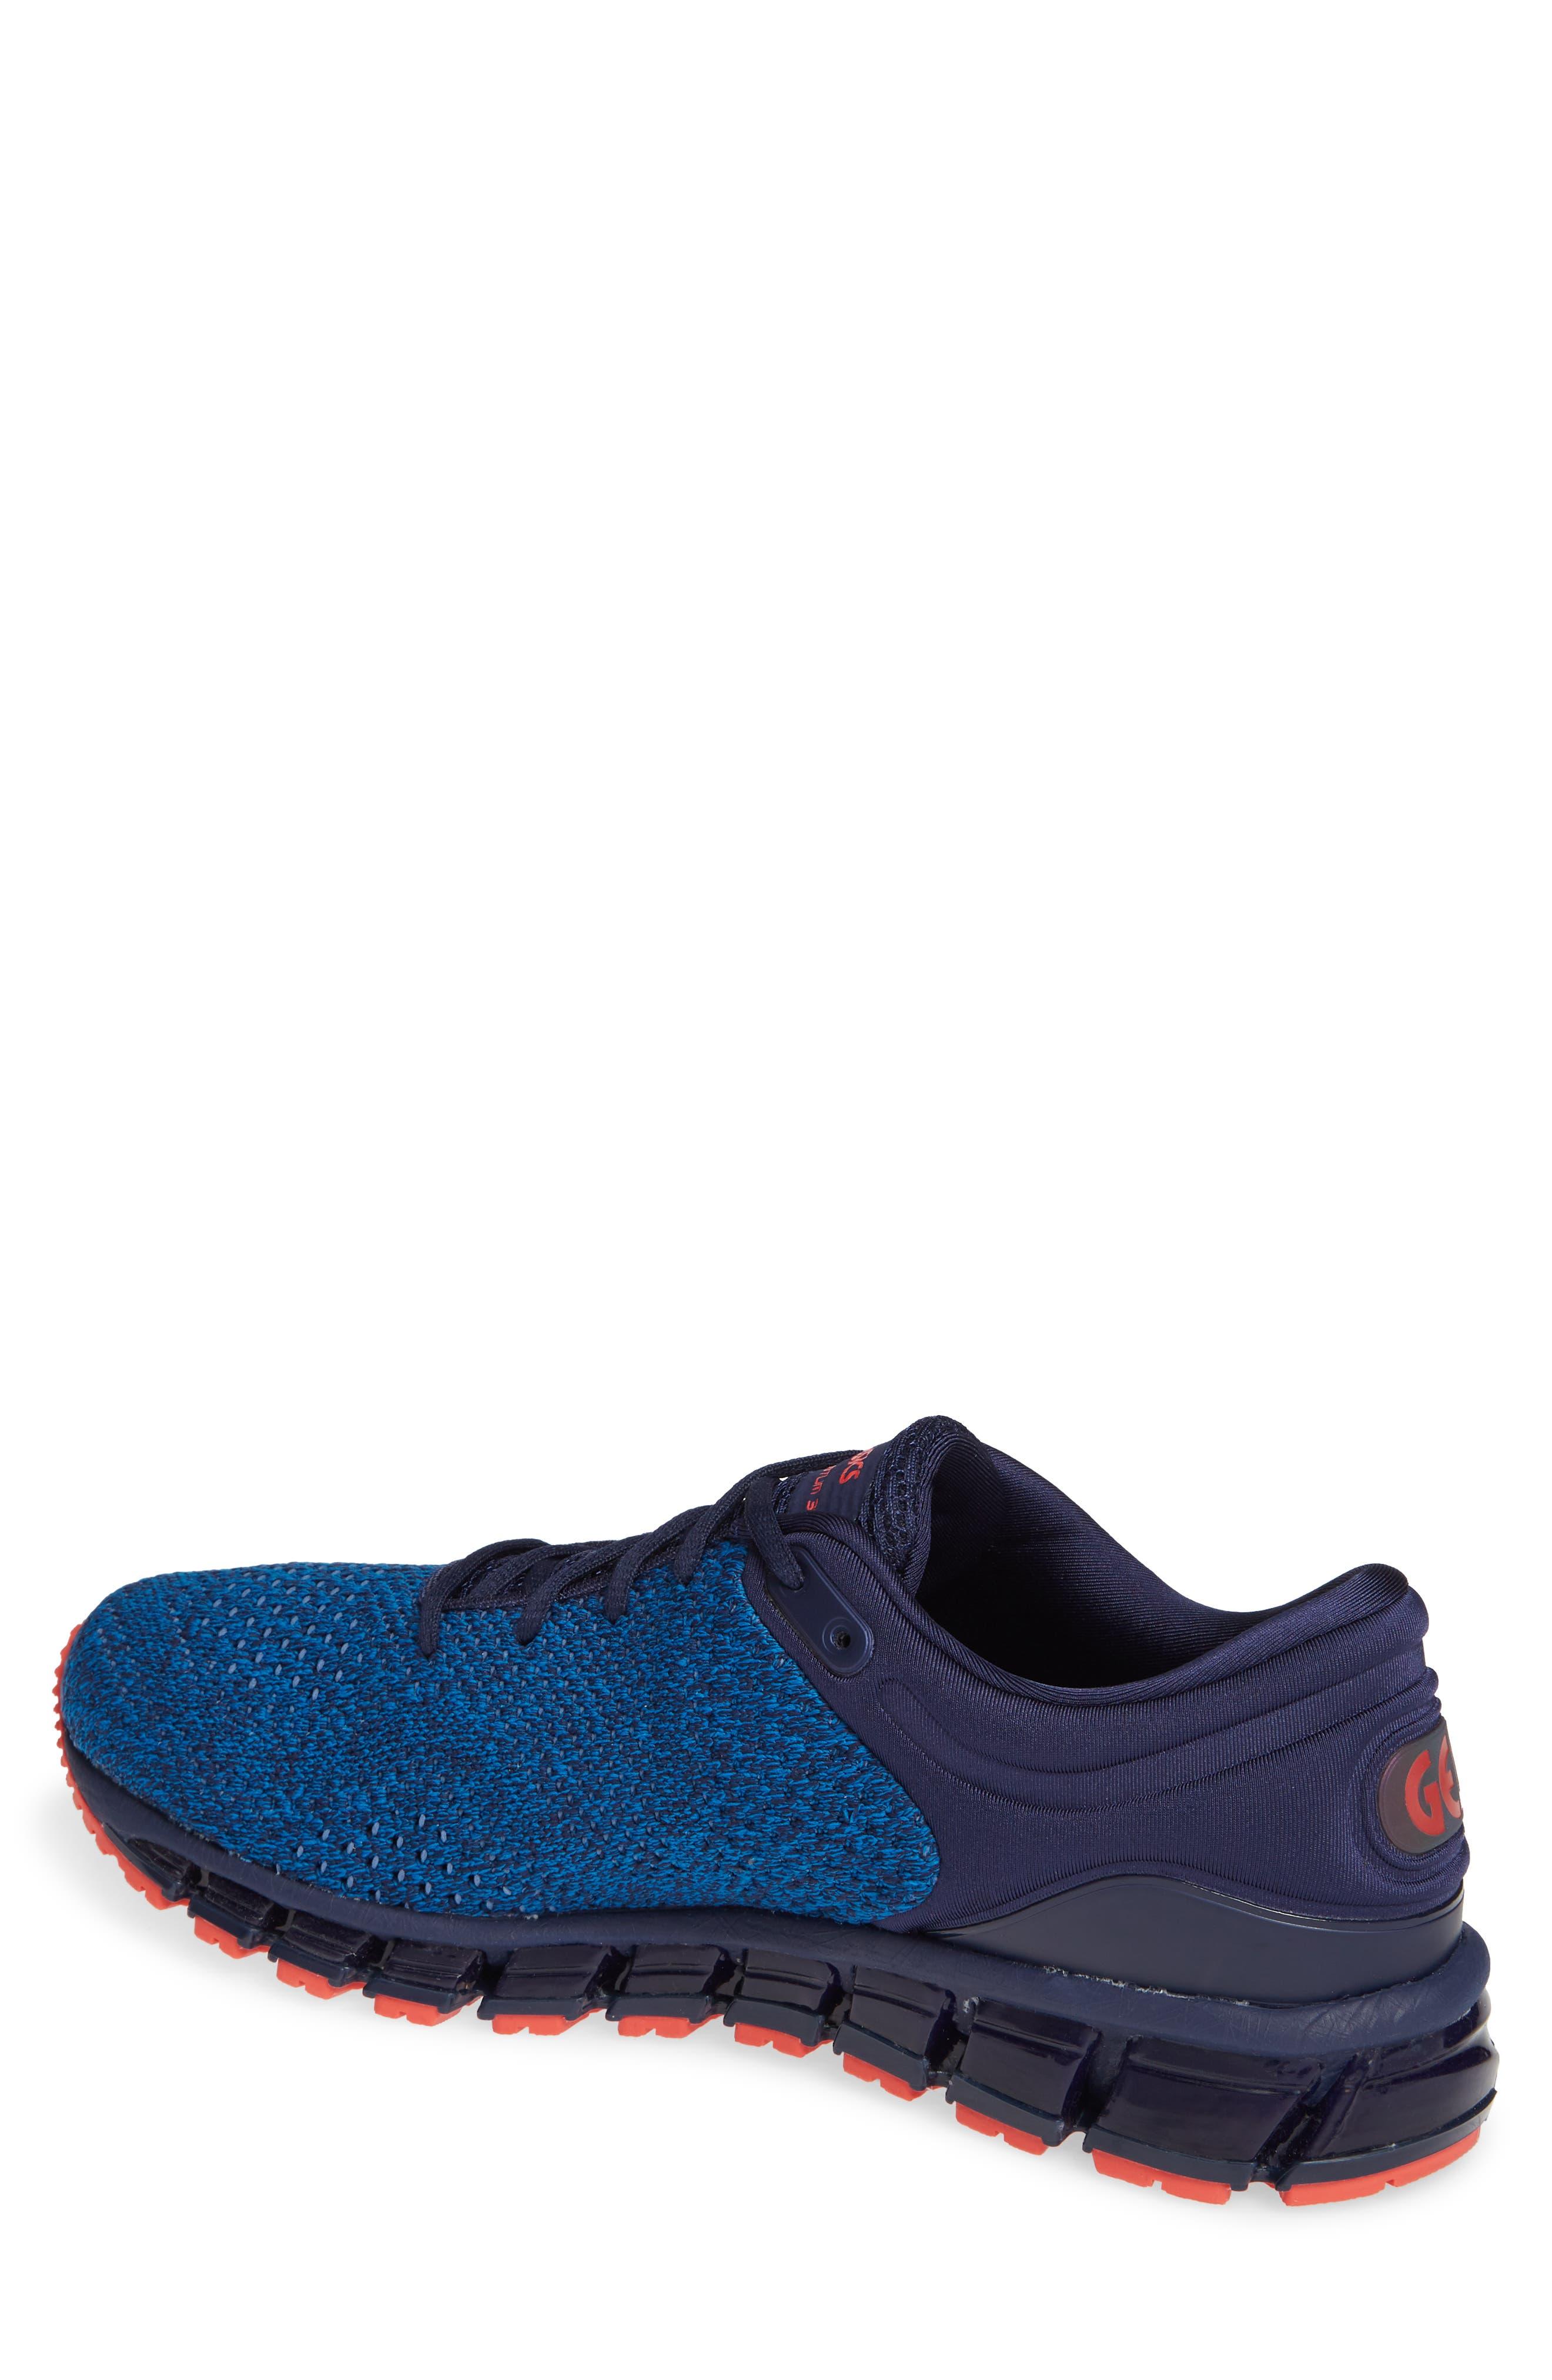 GEL-Quantum 360 Running Shoe,                             Alternate thumbnail 2, color,                             RACE BLUE